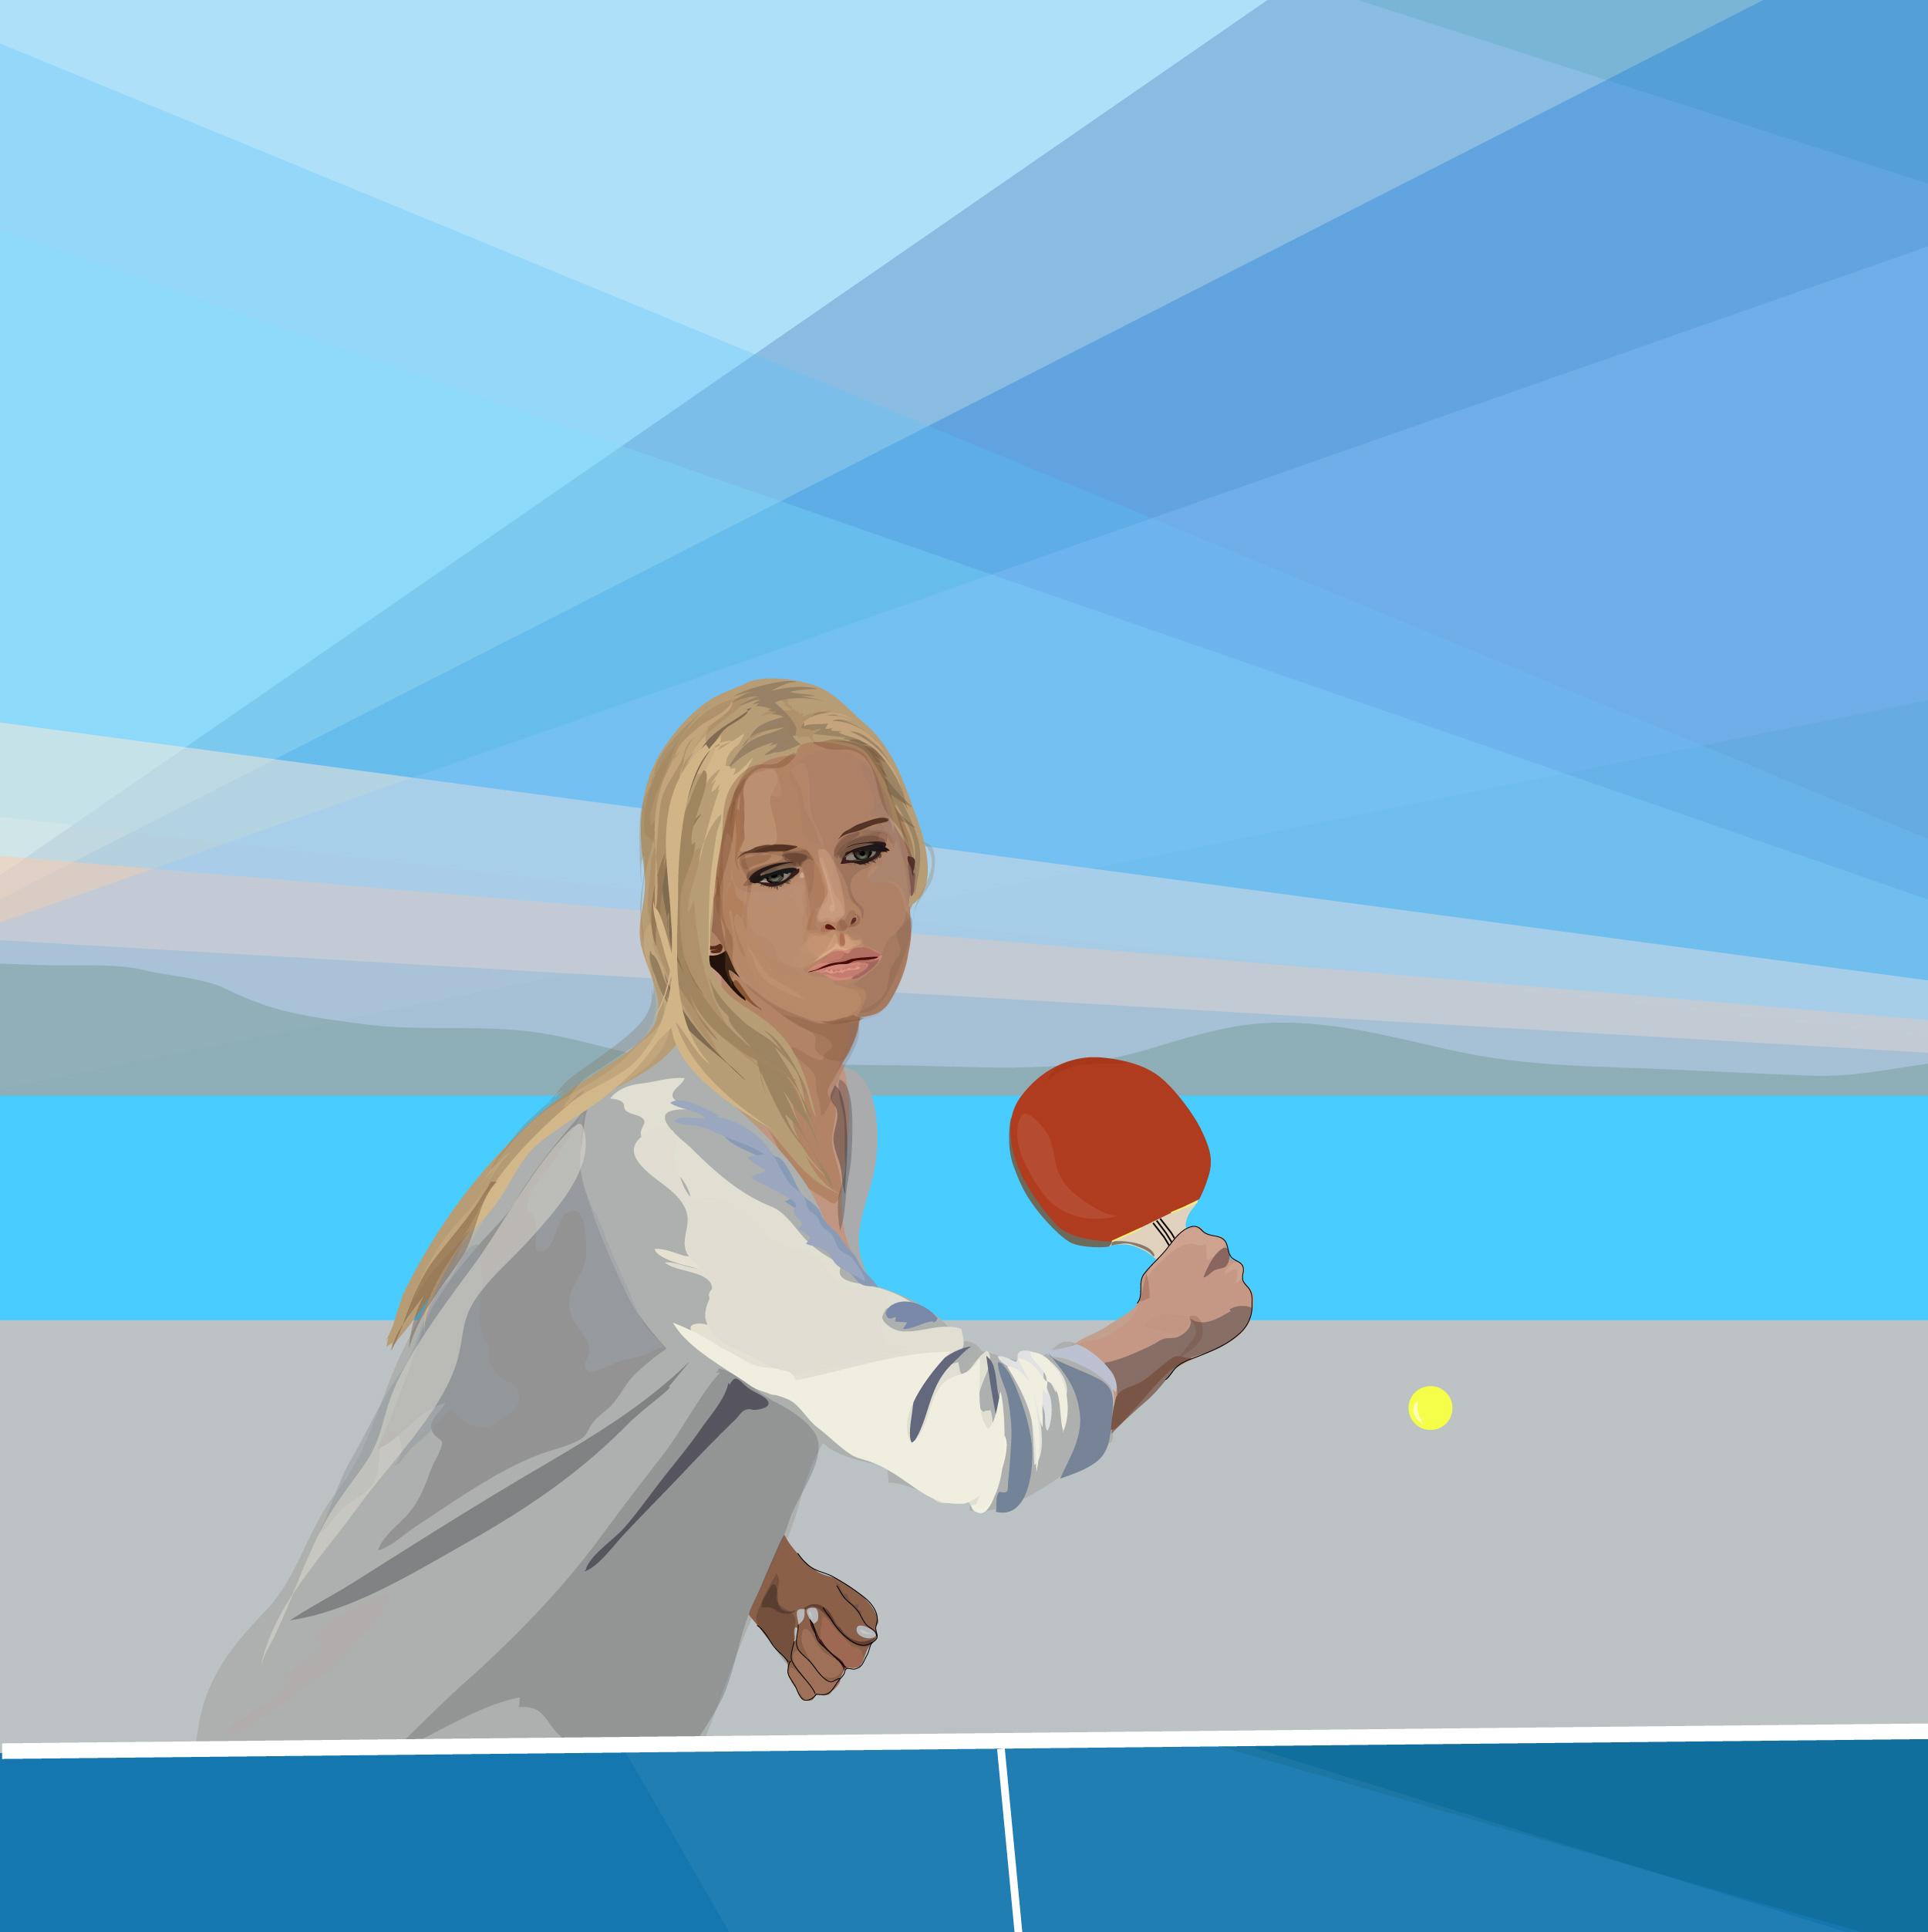 ping_pong_fin1.jpg